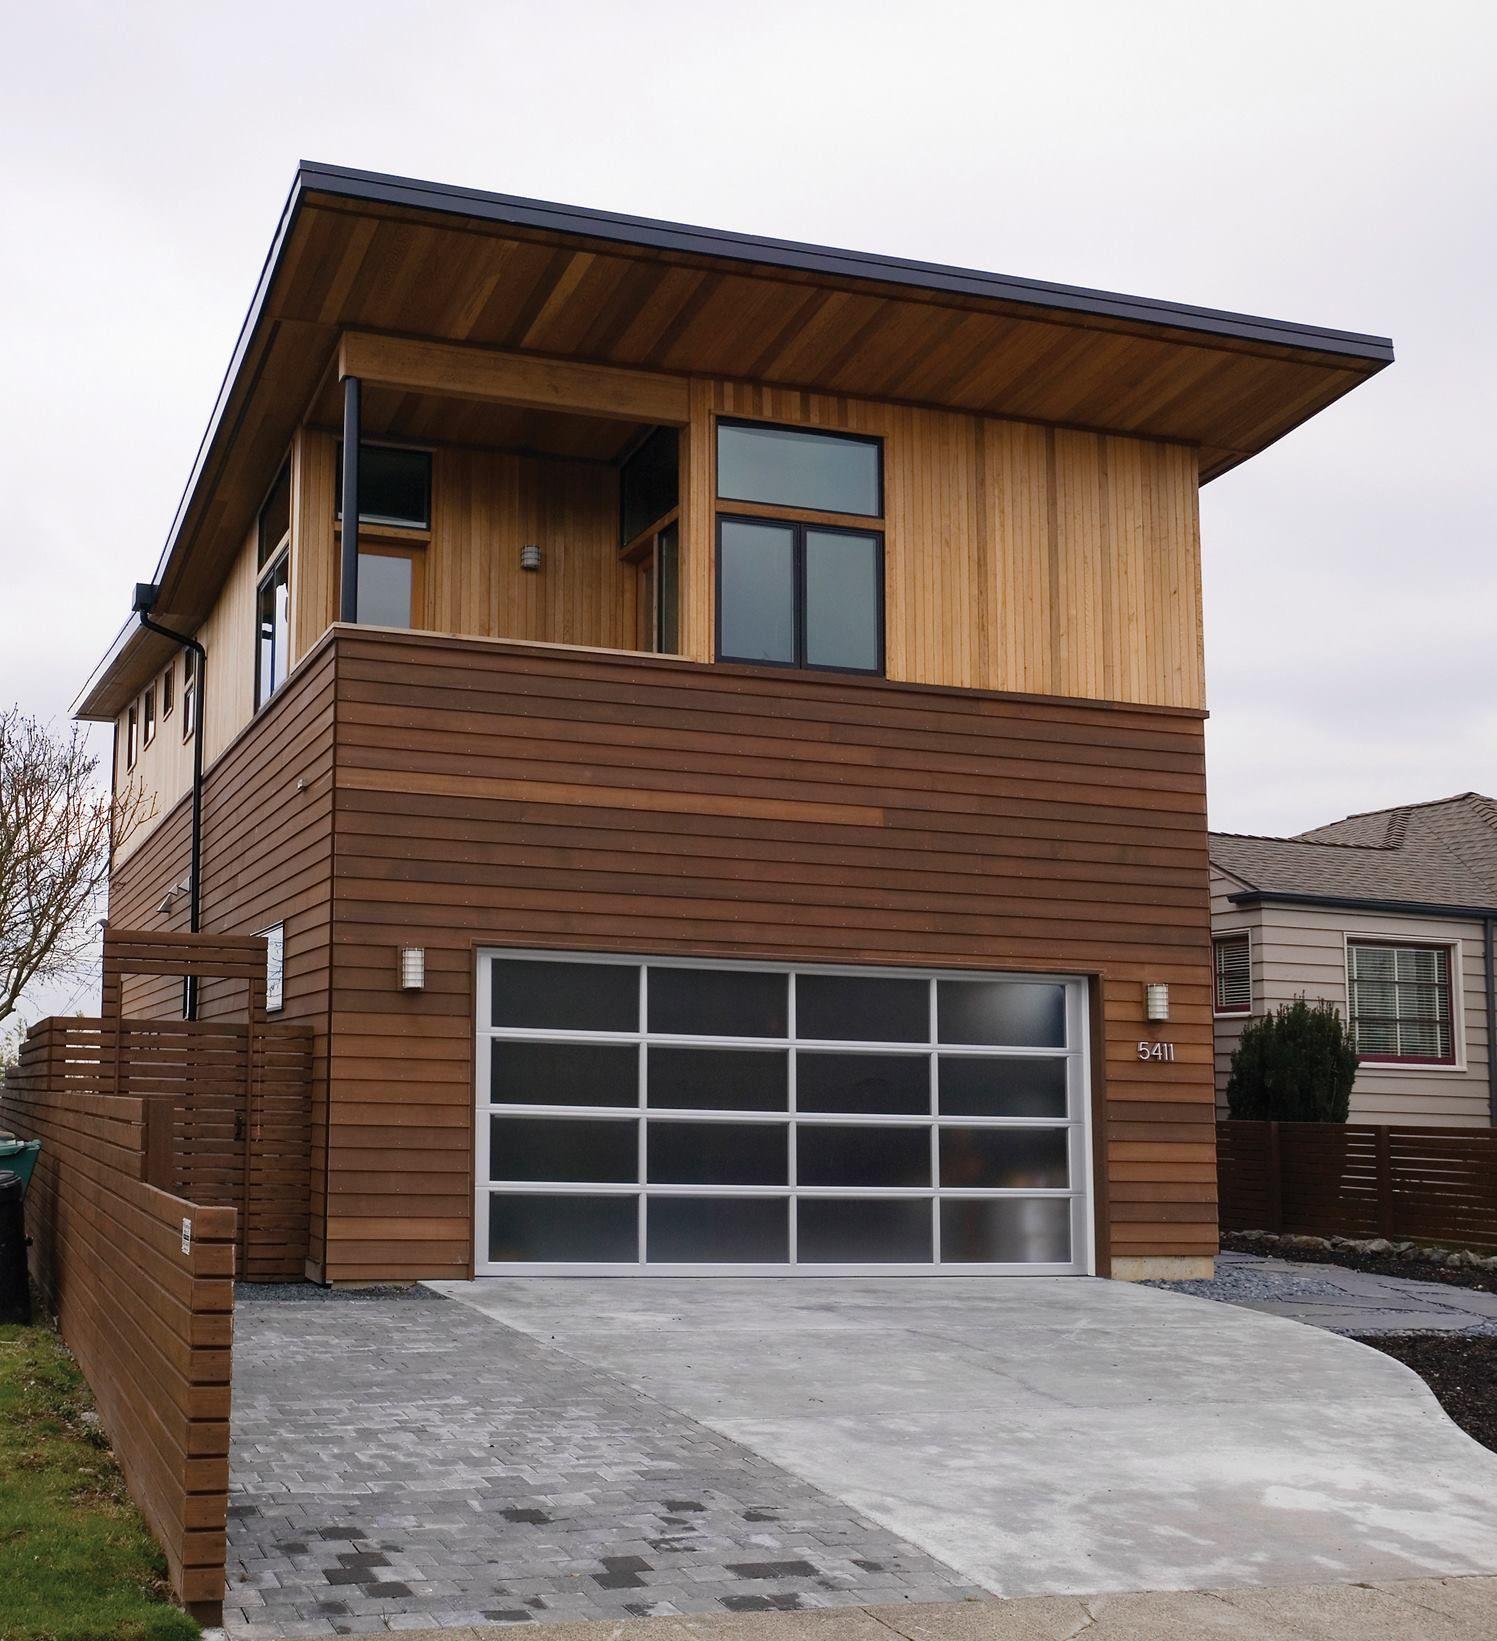 Modern Garage Apartment Designs Ideas 18: Blip Design: Avante Garage Doors From Clopay Building